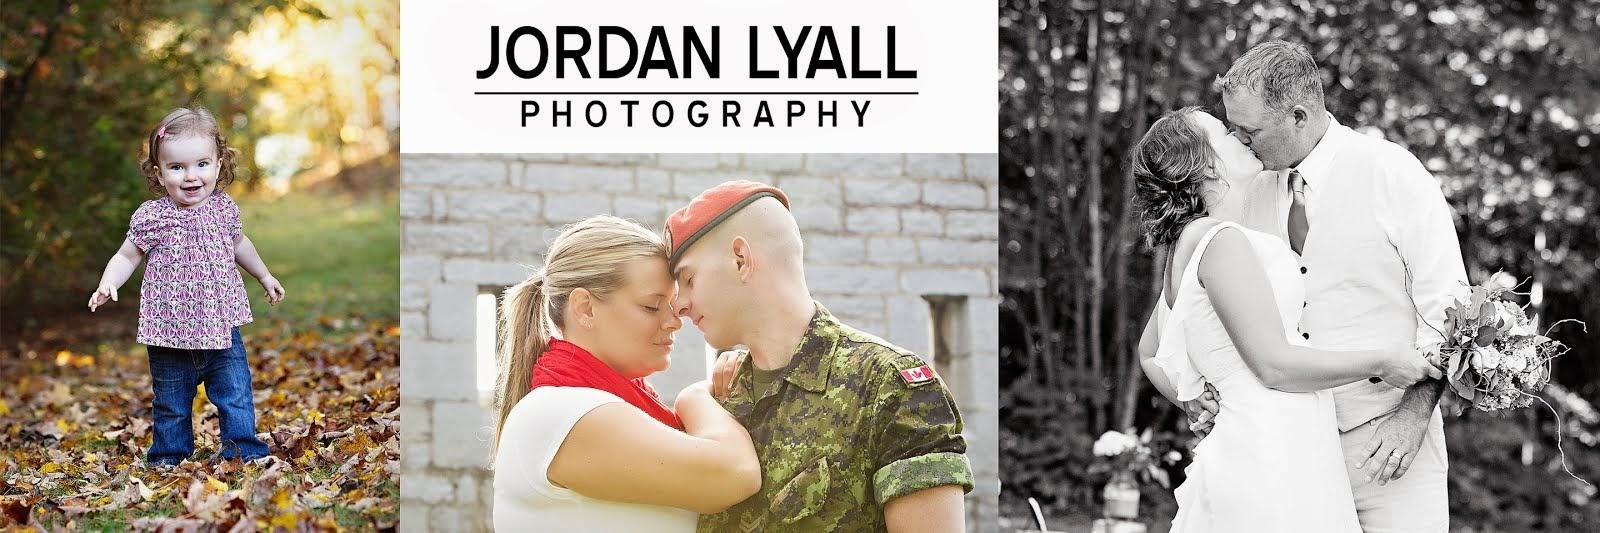 Jordan Lyall Photography.  Beautiful Moments deserve Beautiful Photographs.